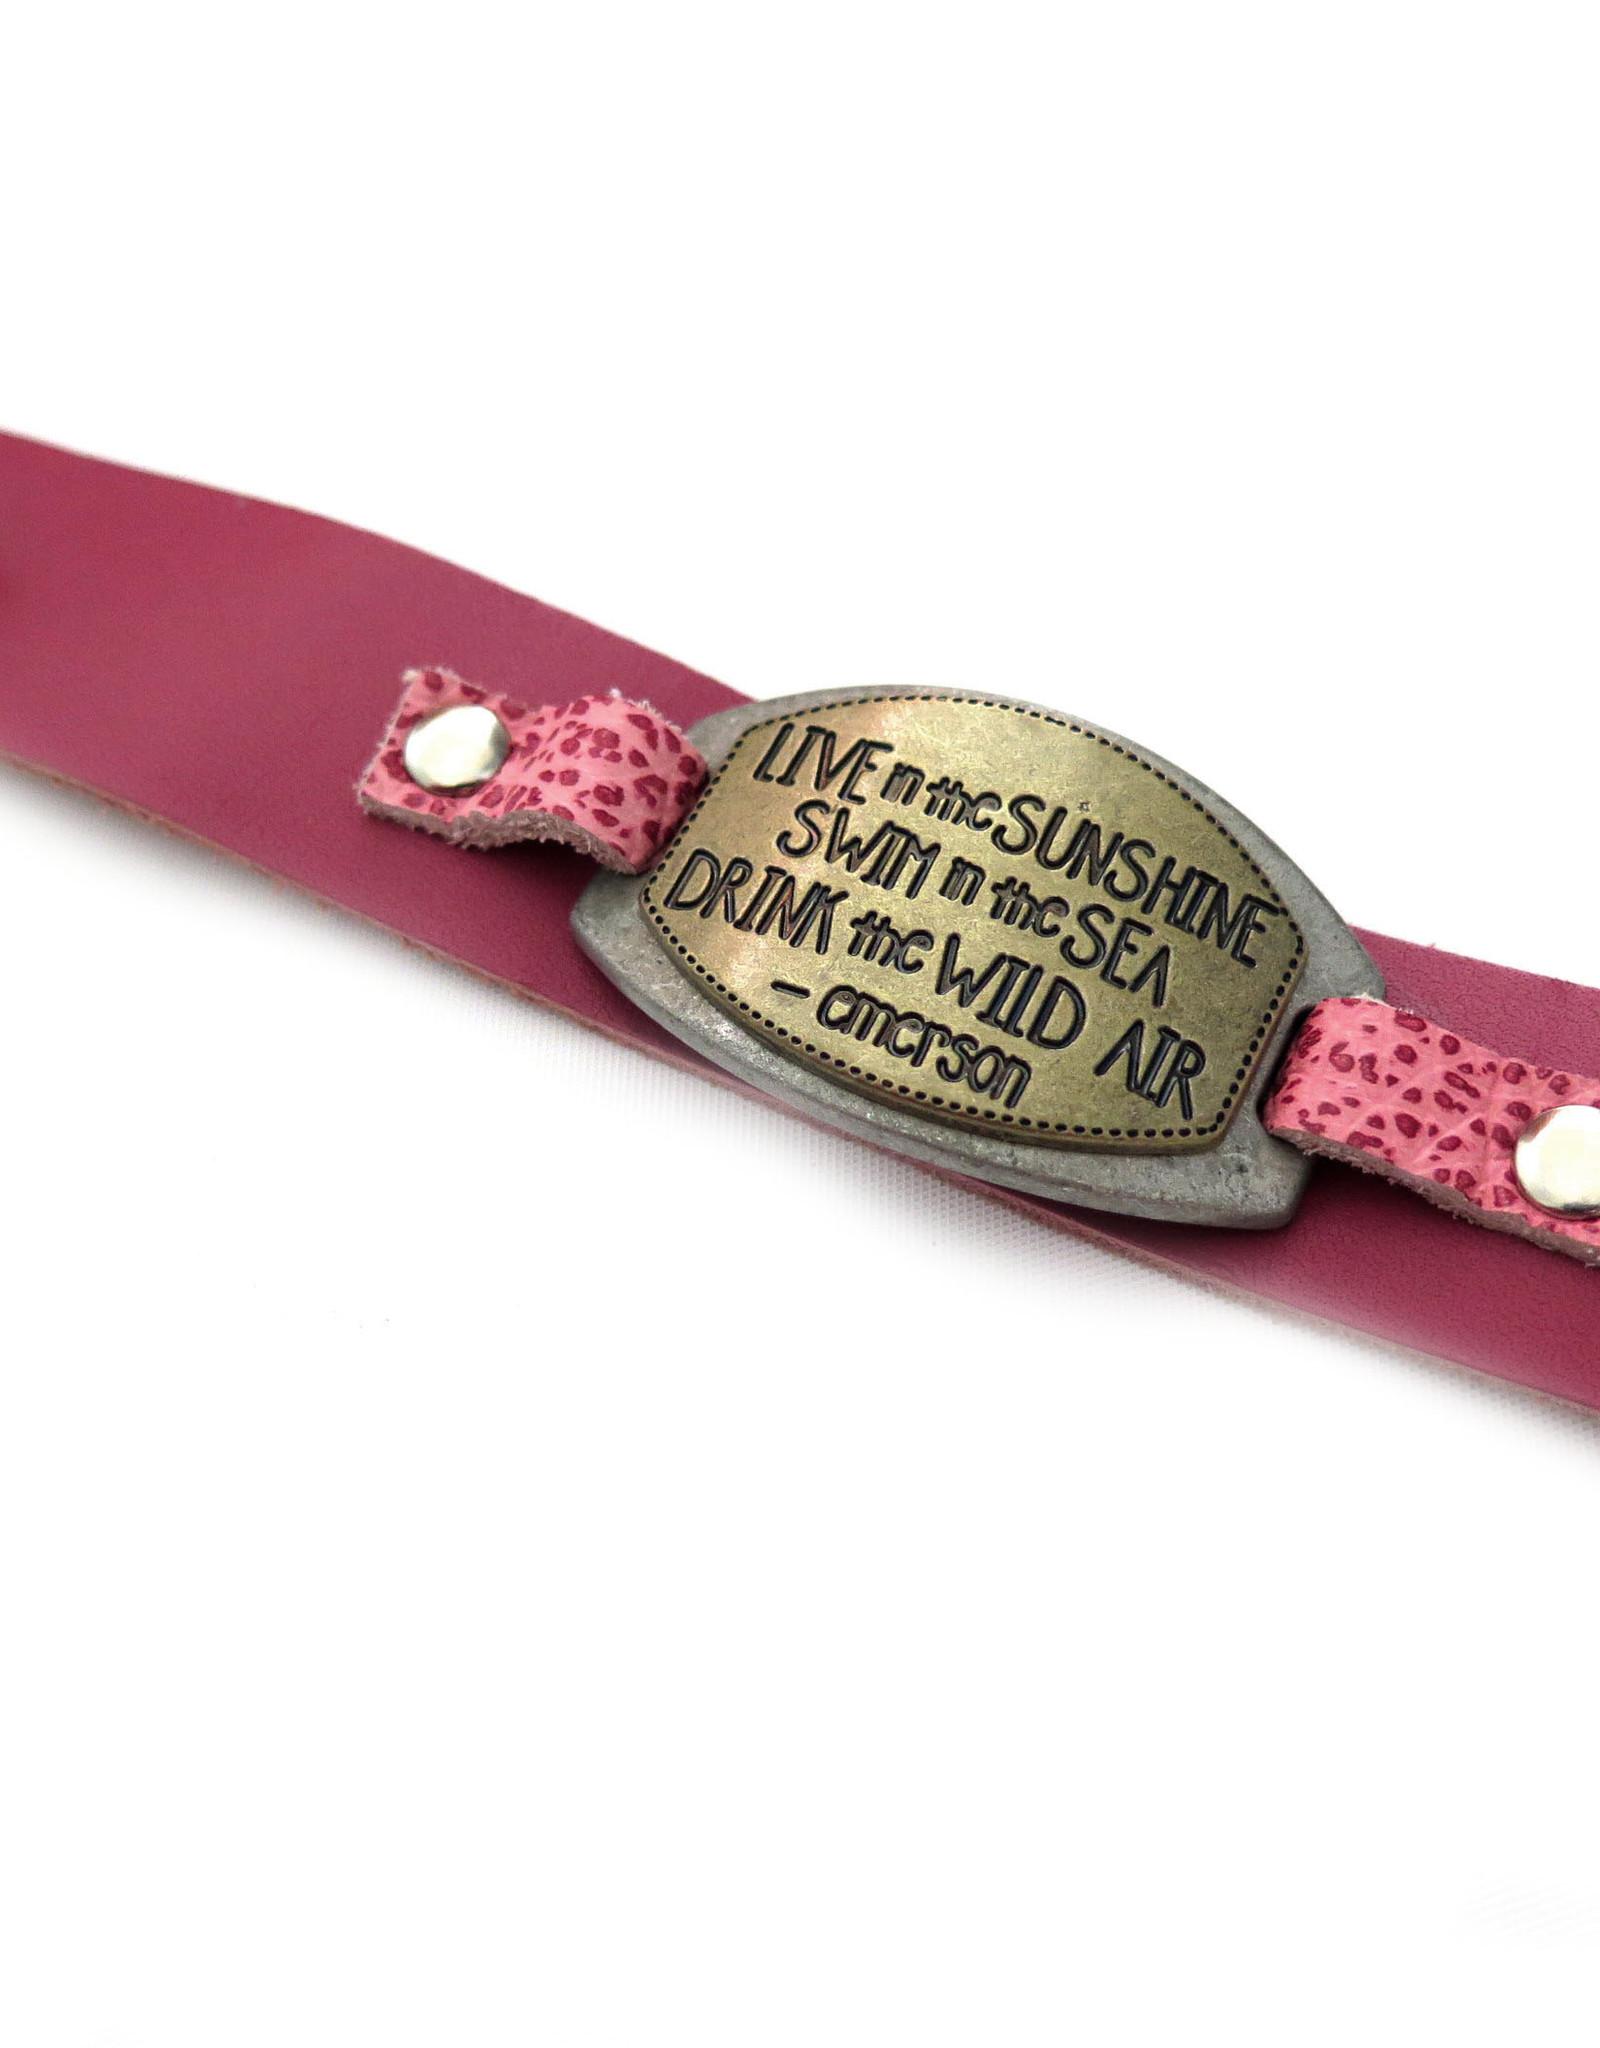 Leather Bracelet w/ Metal Connector by Eva Airam Studio